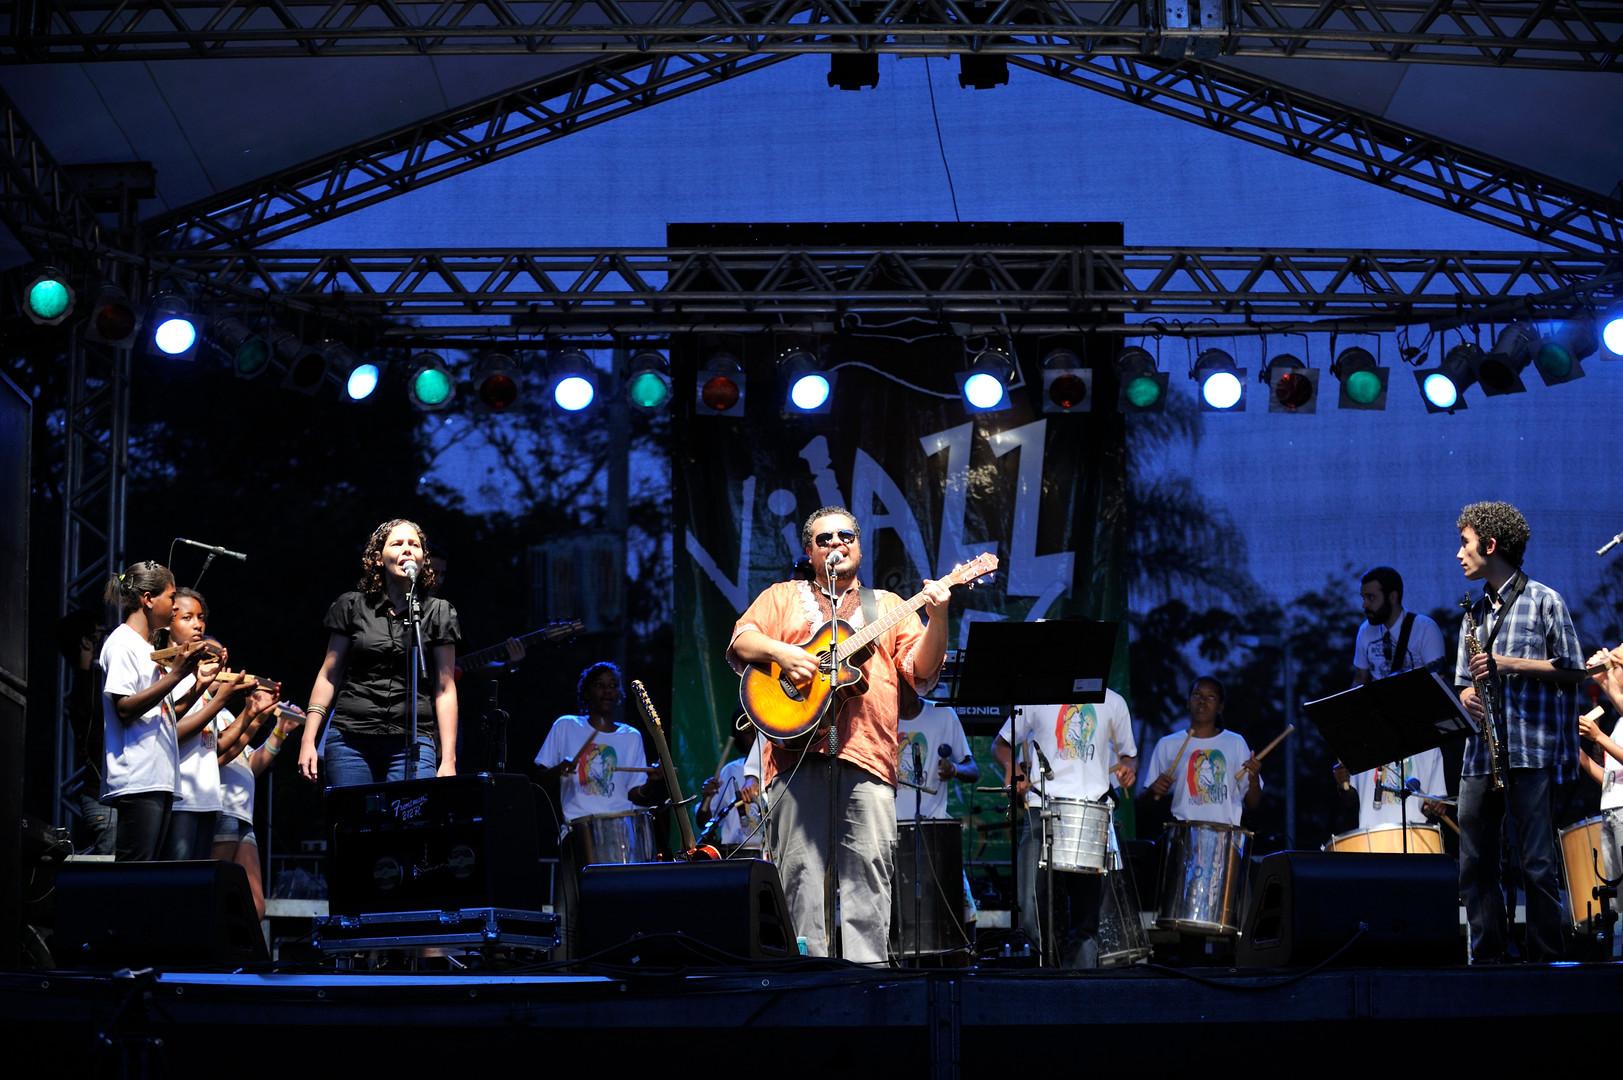 2012.09.01_ViJazz&Blues_Festival_REY8401